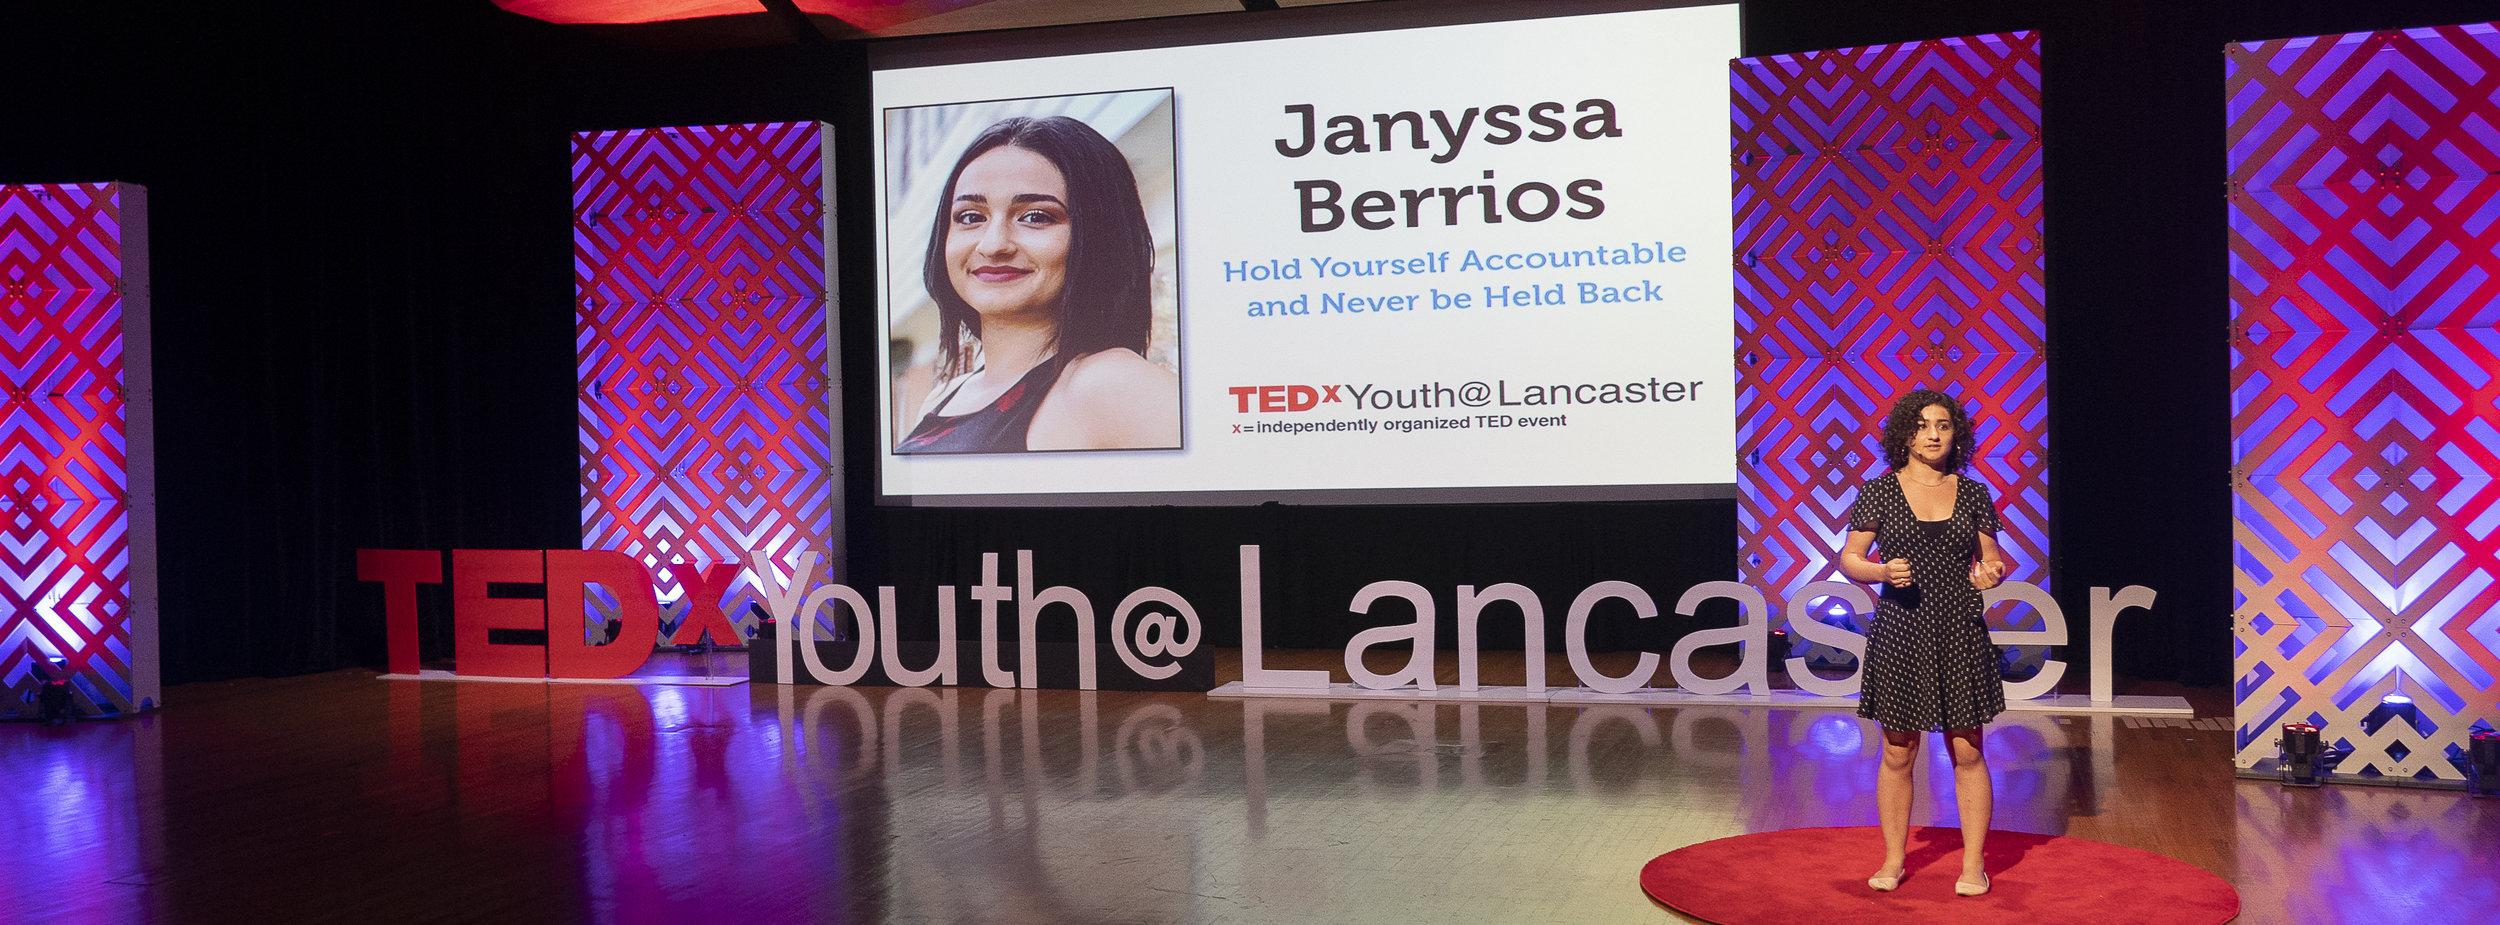 speaker-janyssa-berrios_48522593271_o.jpg